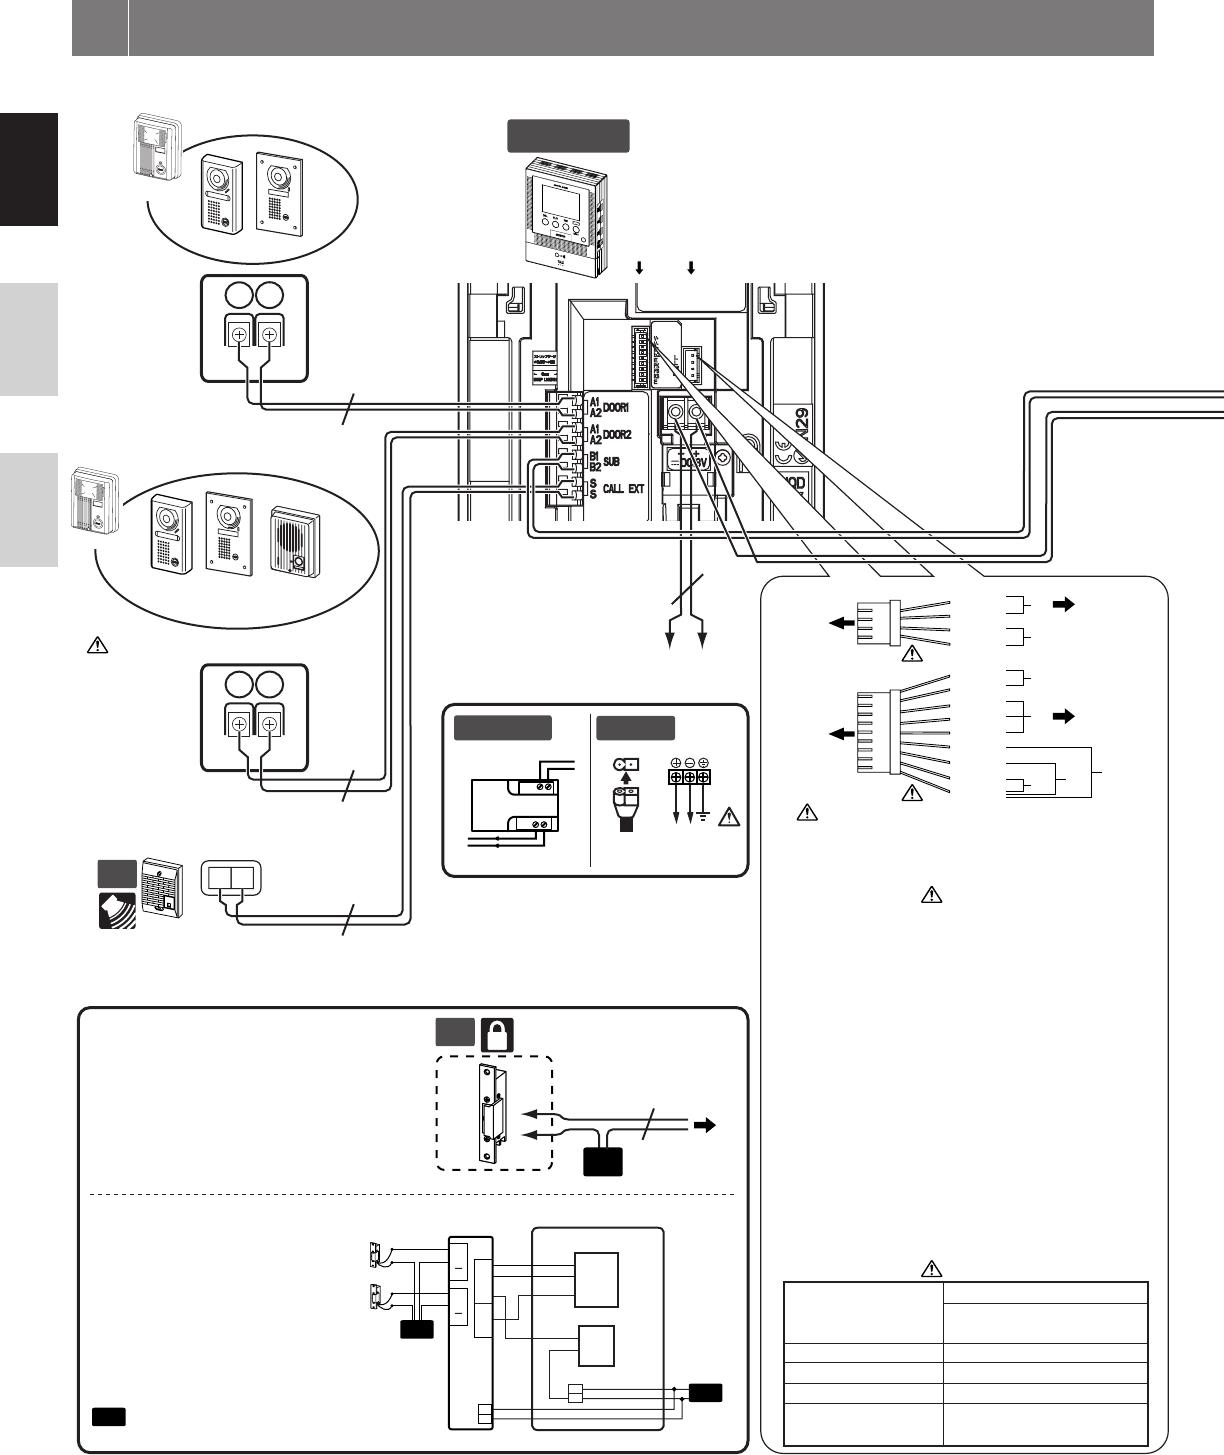 wiring diagram of intercom